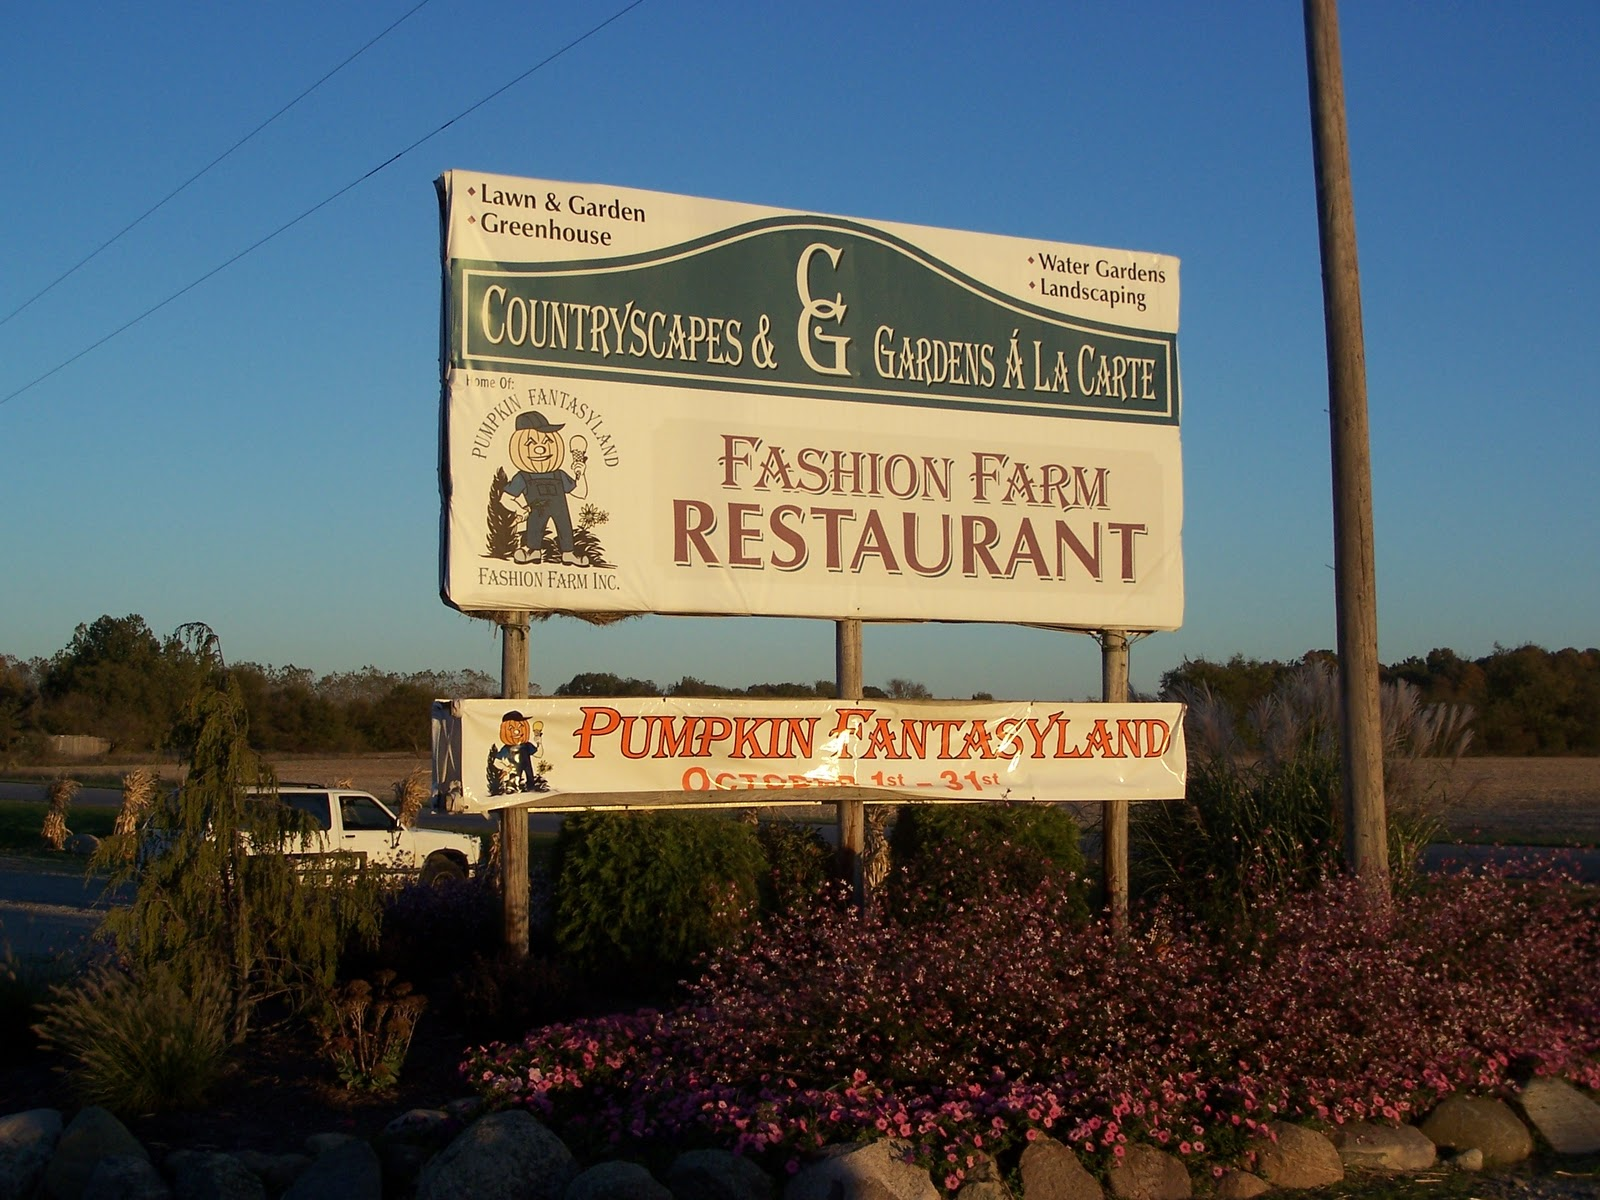 Pumpkin fantasyland youtube.